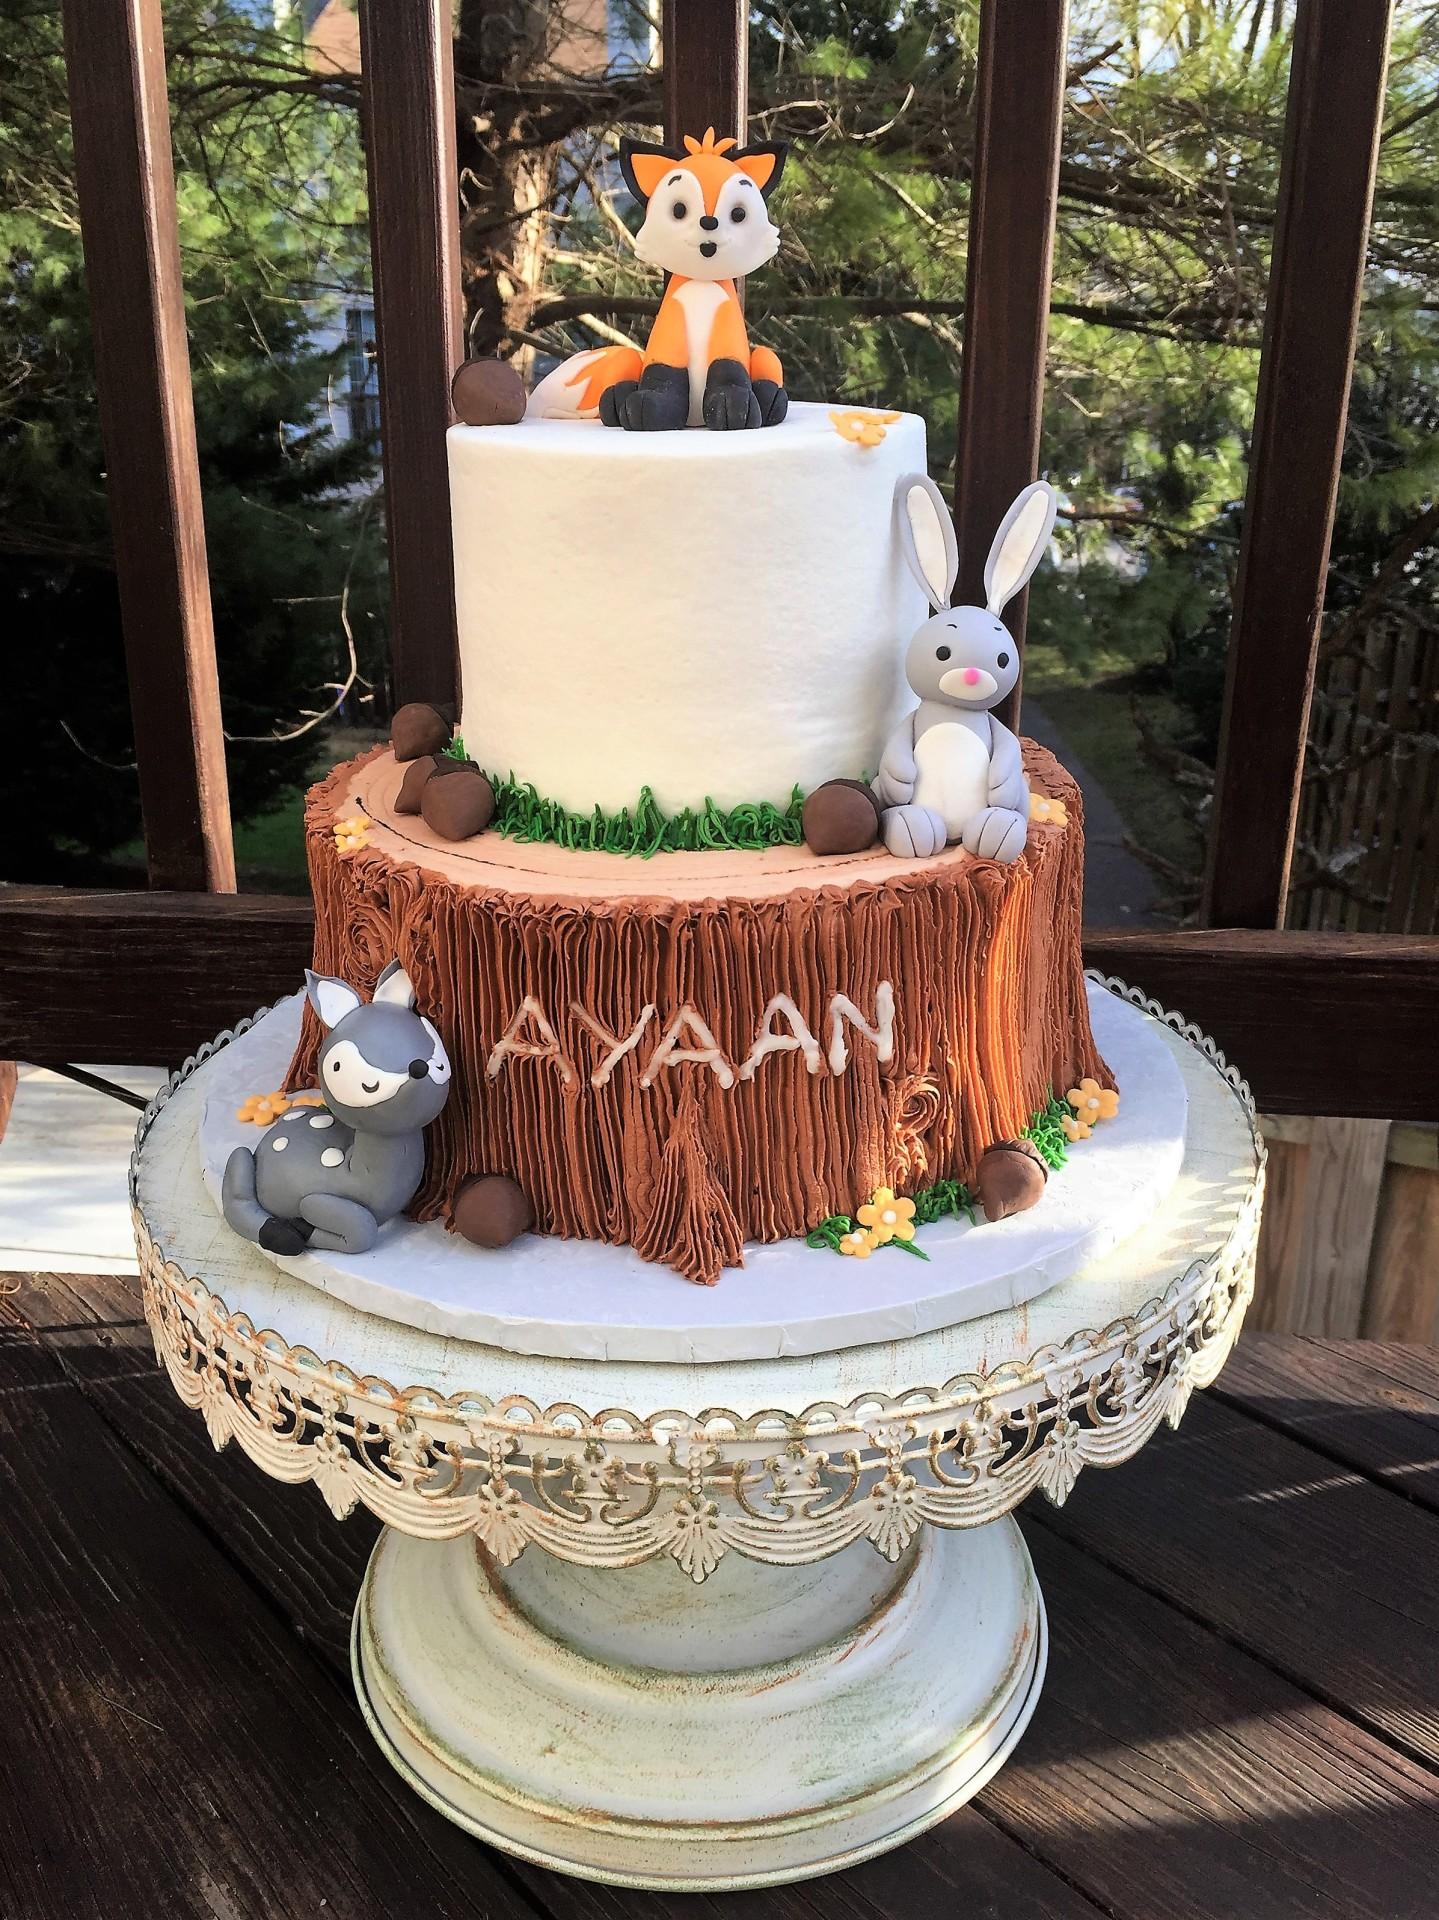 Woodlands theme buttercream cake with fondant animals